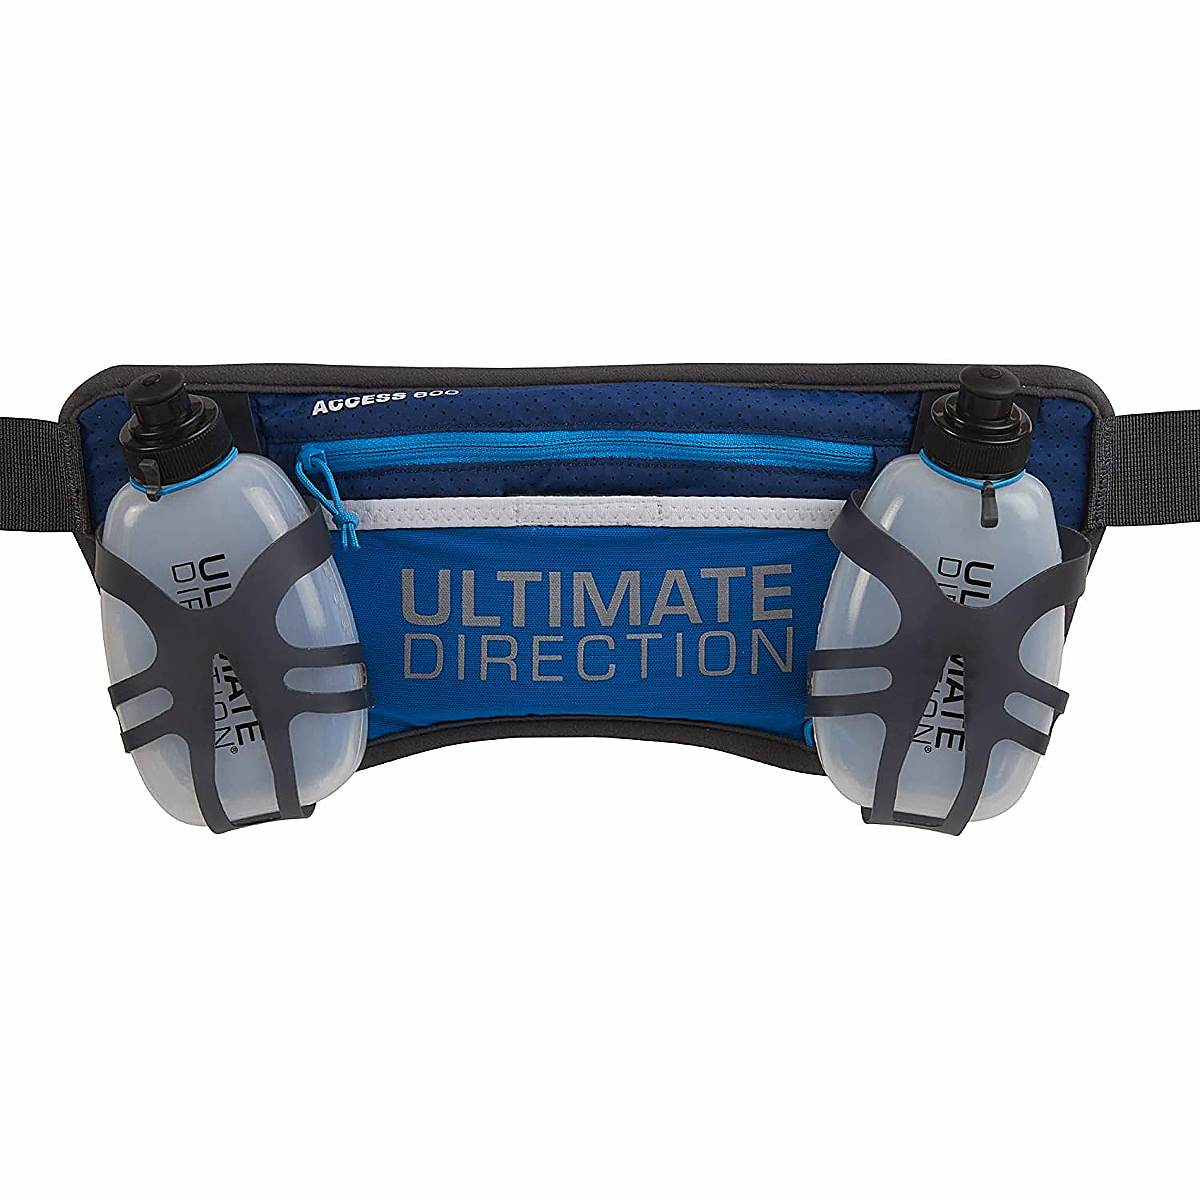 Ultimate Direction Access 600 - Color: Signature Blue - Size: One Size, Signature Blue, large, image 1